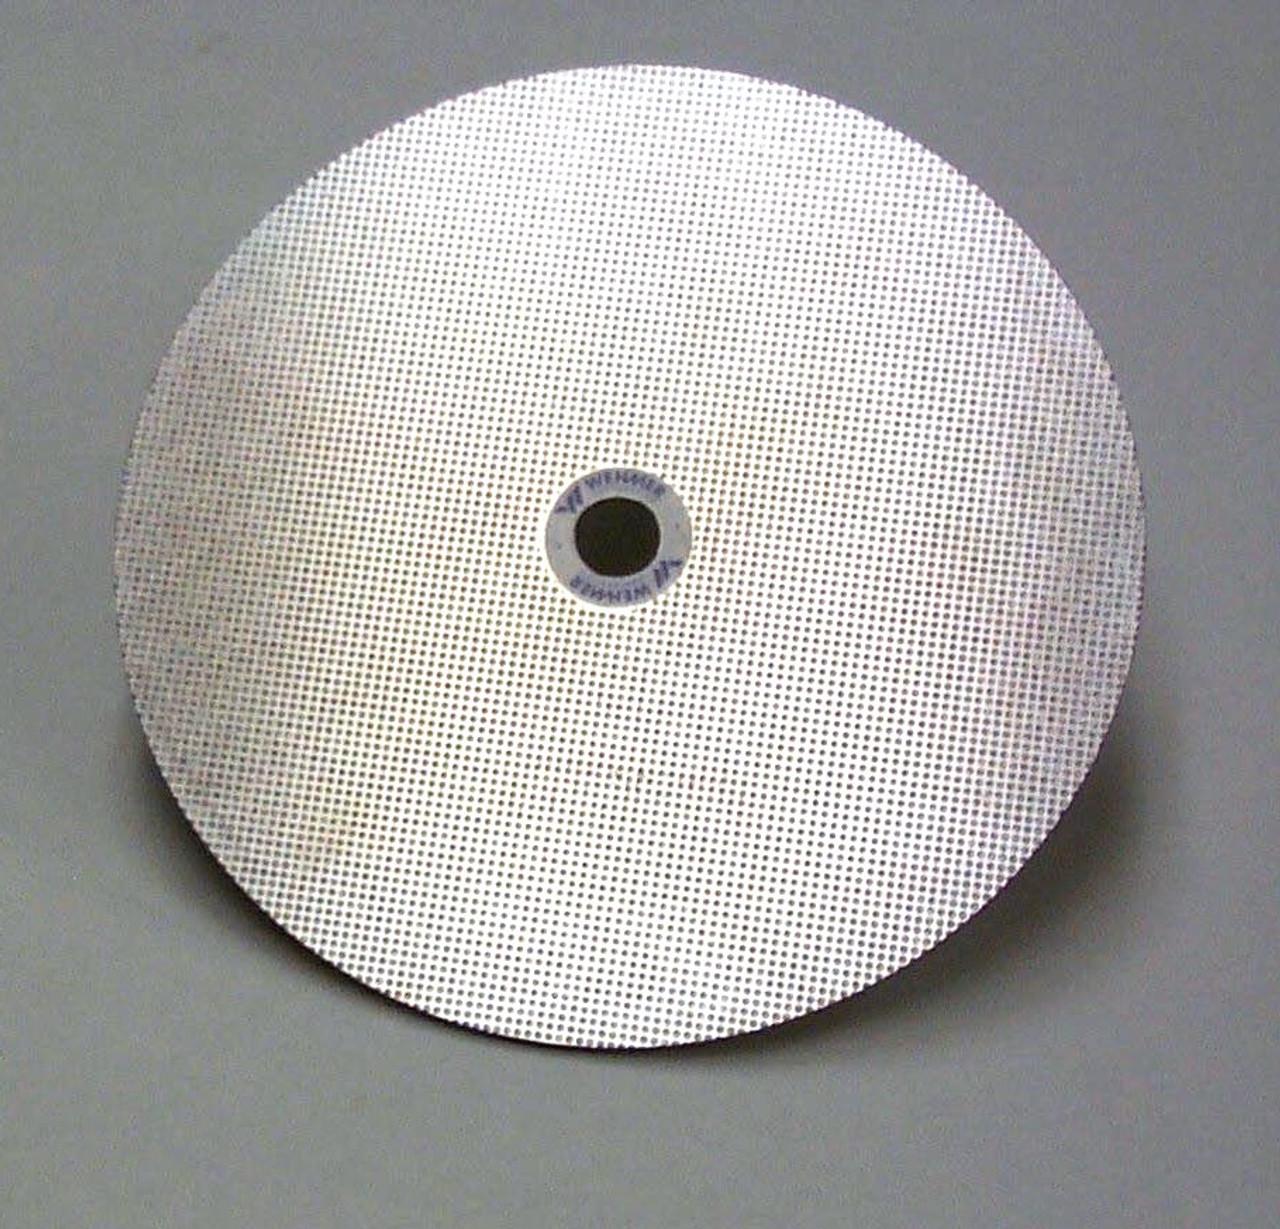 WEHMER Diamond Trimming Wheel - Coarse